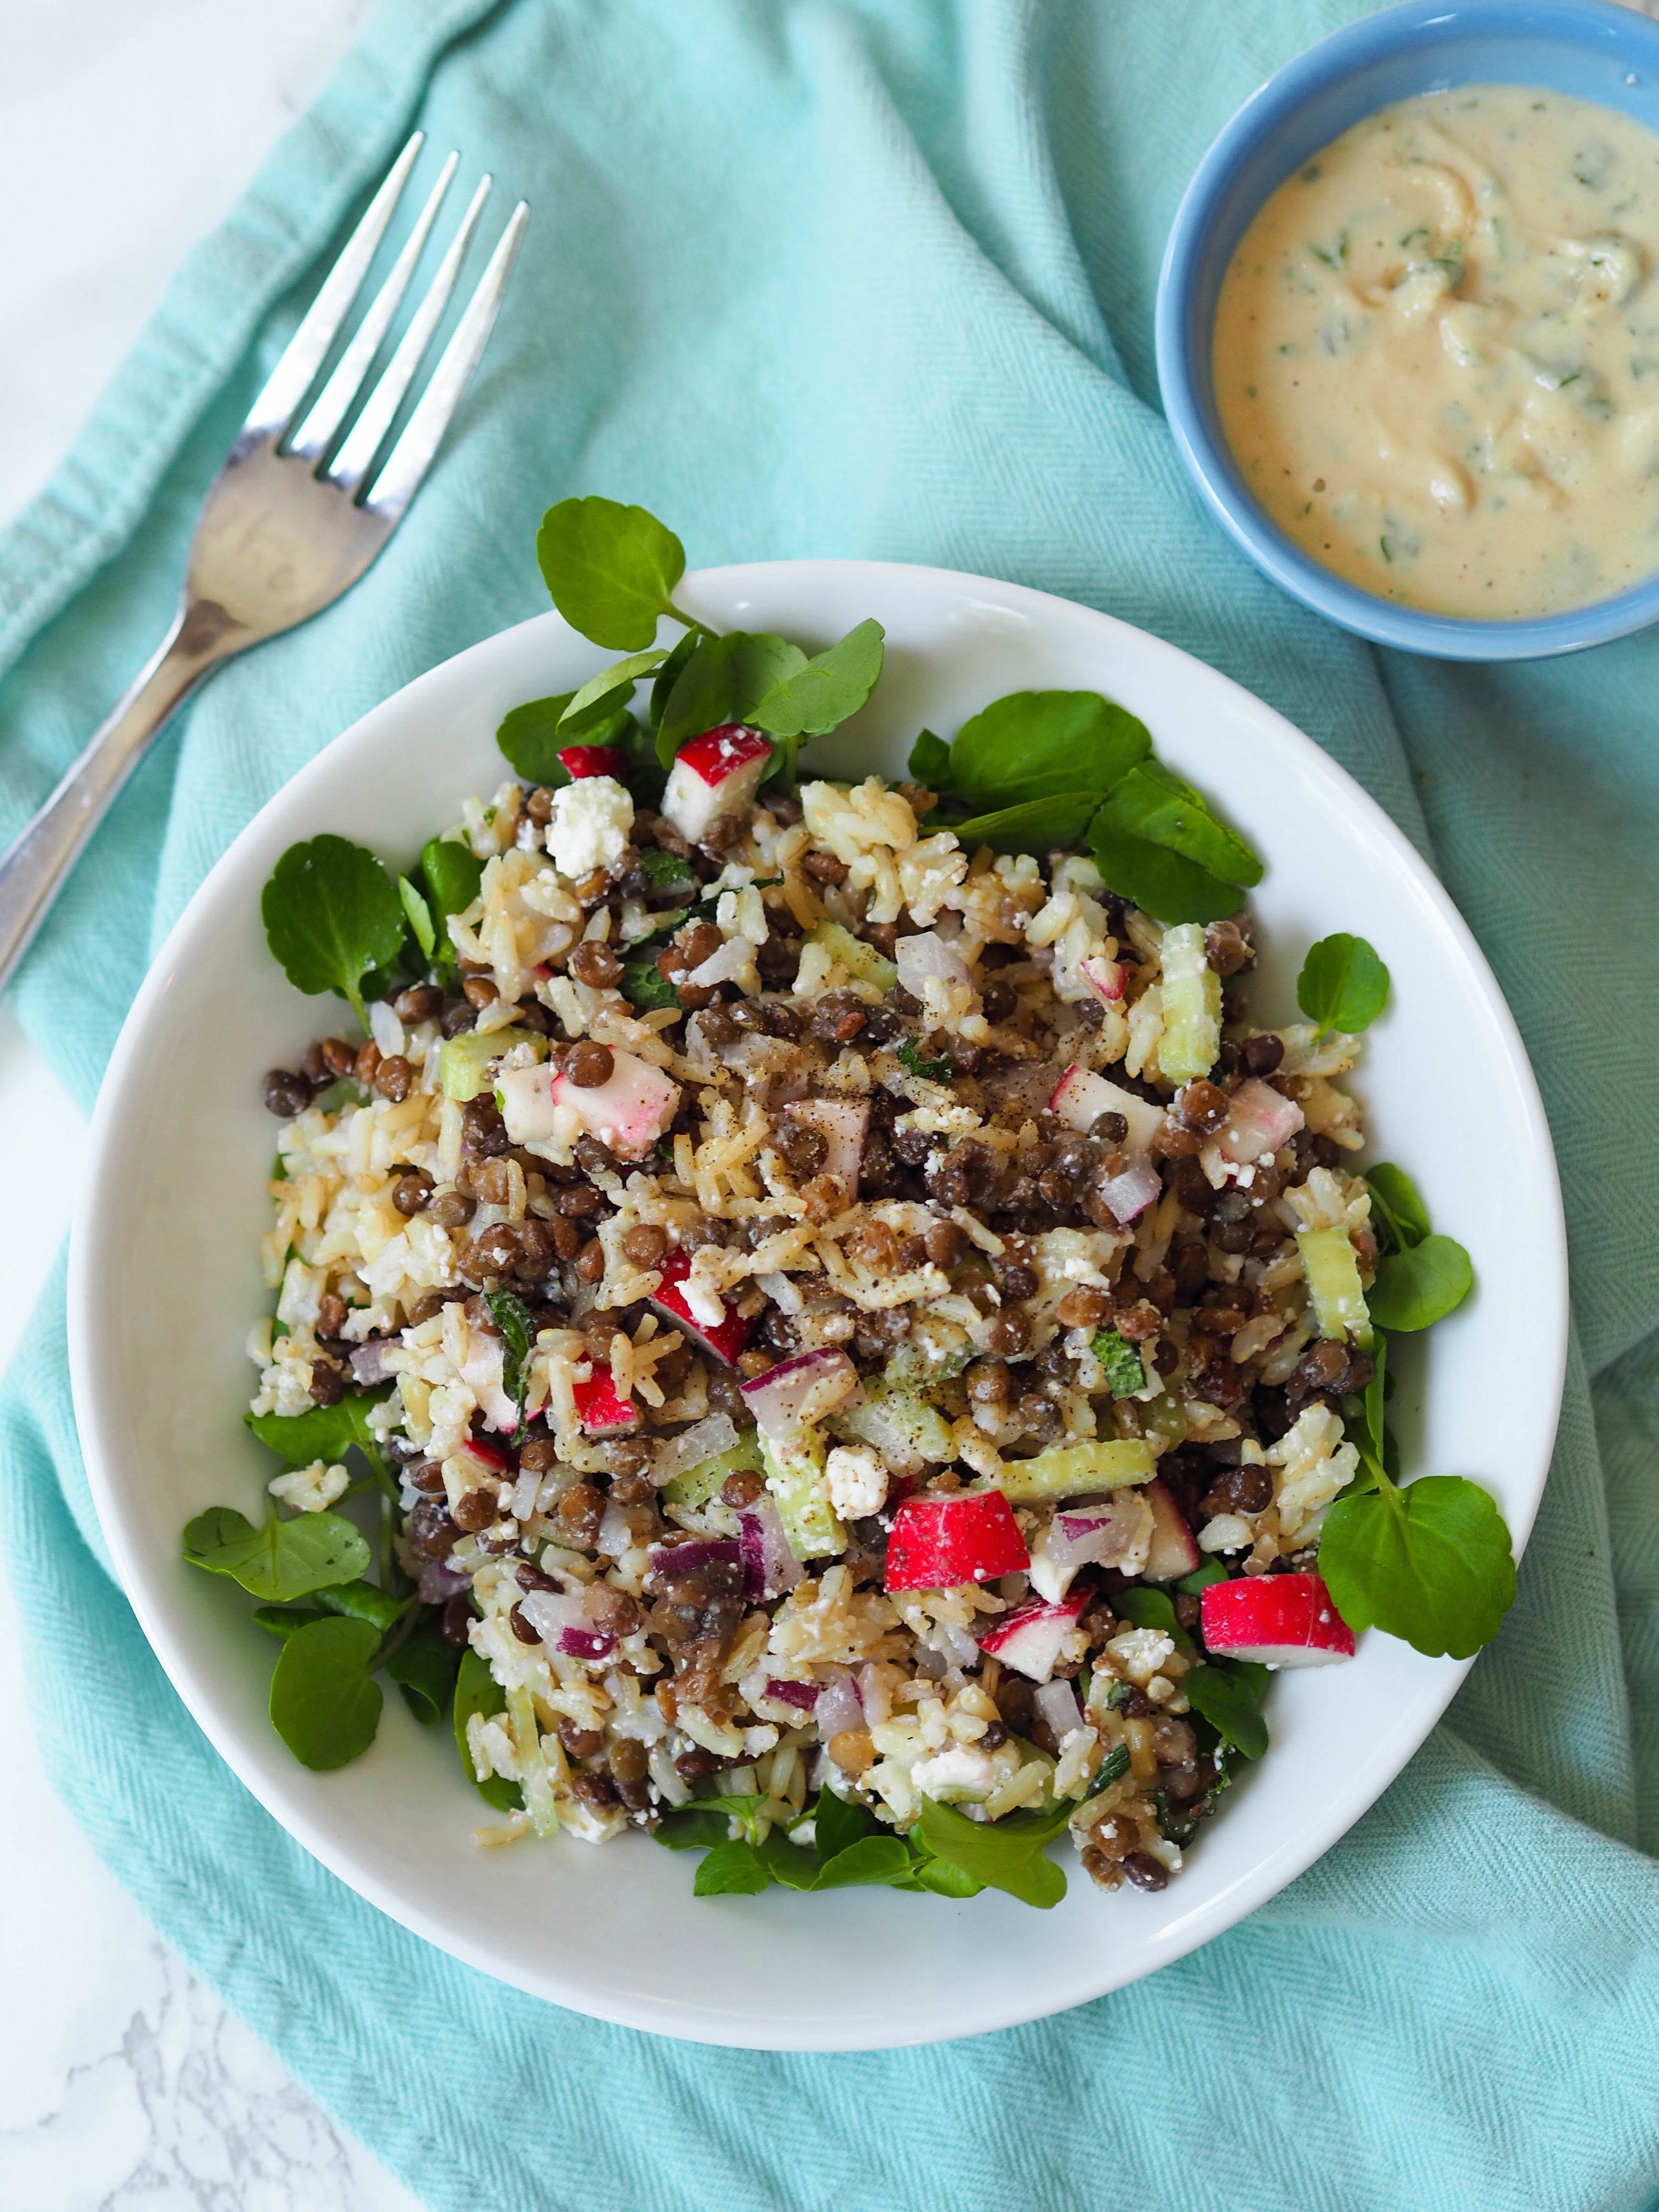 lentil-brown-rice-salad-1.jpg